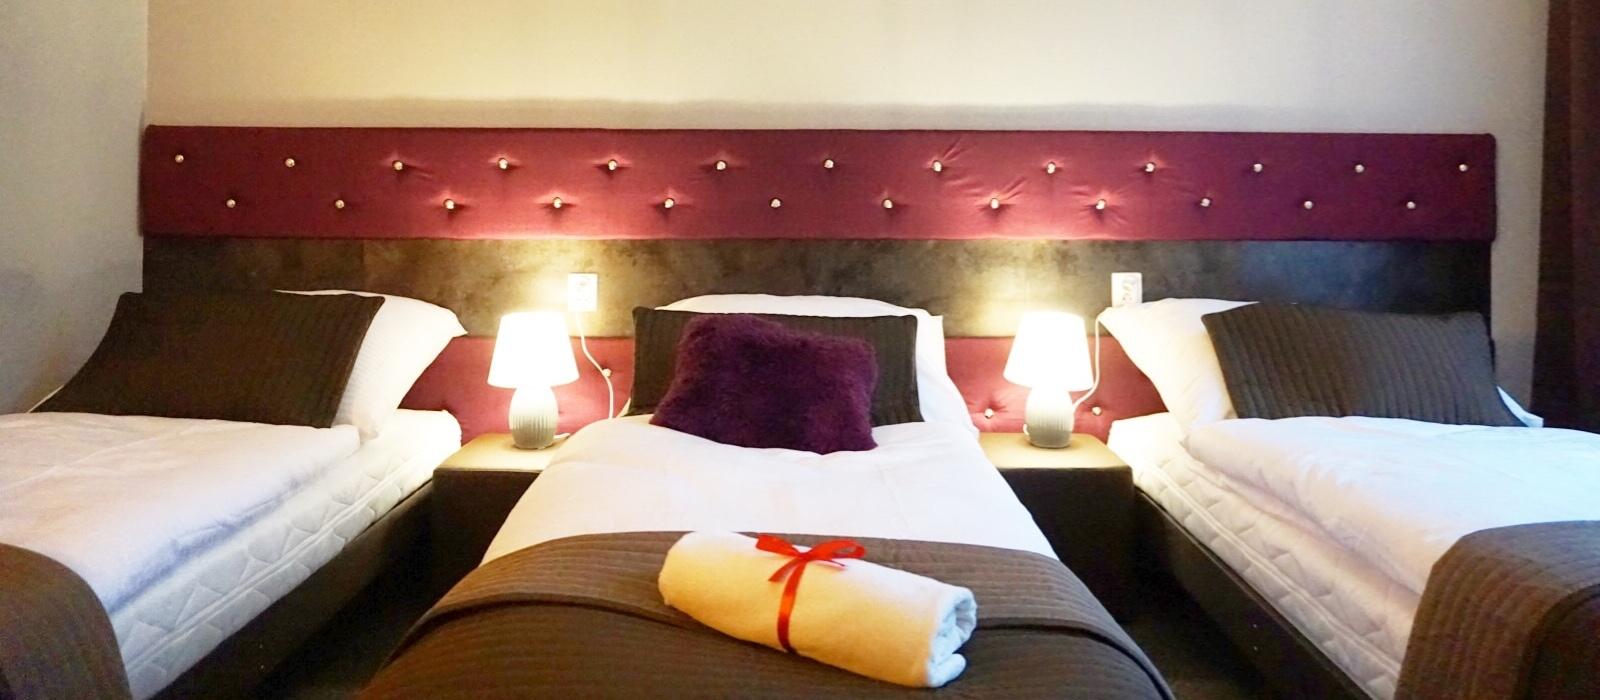 Pokój czteroosobowy Premium w Hotelu Expolis Residence baner